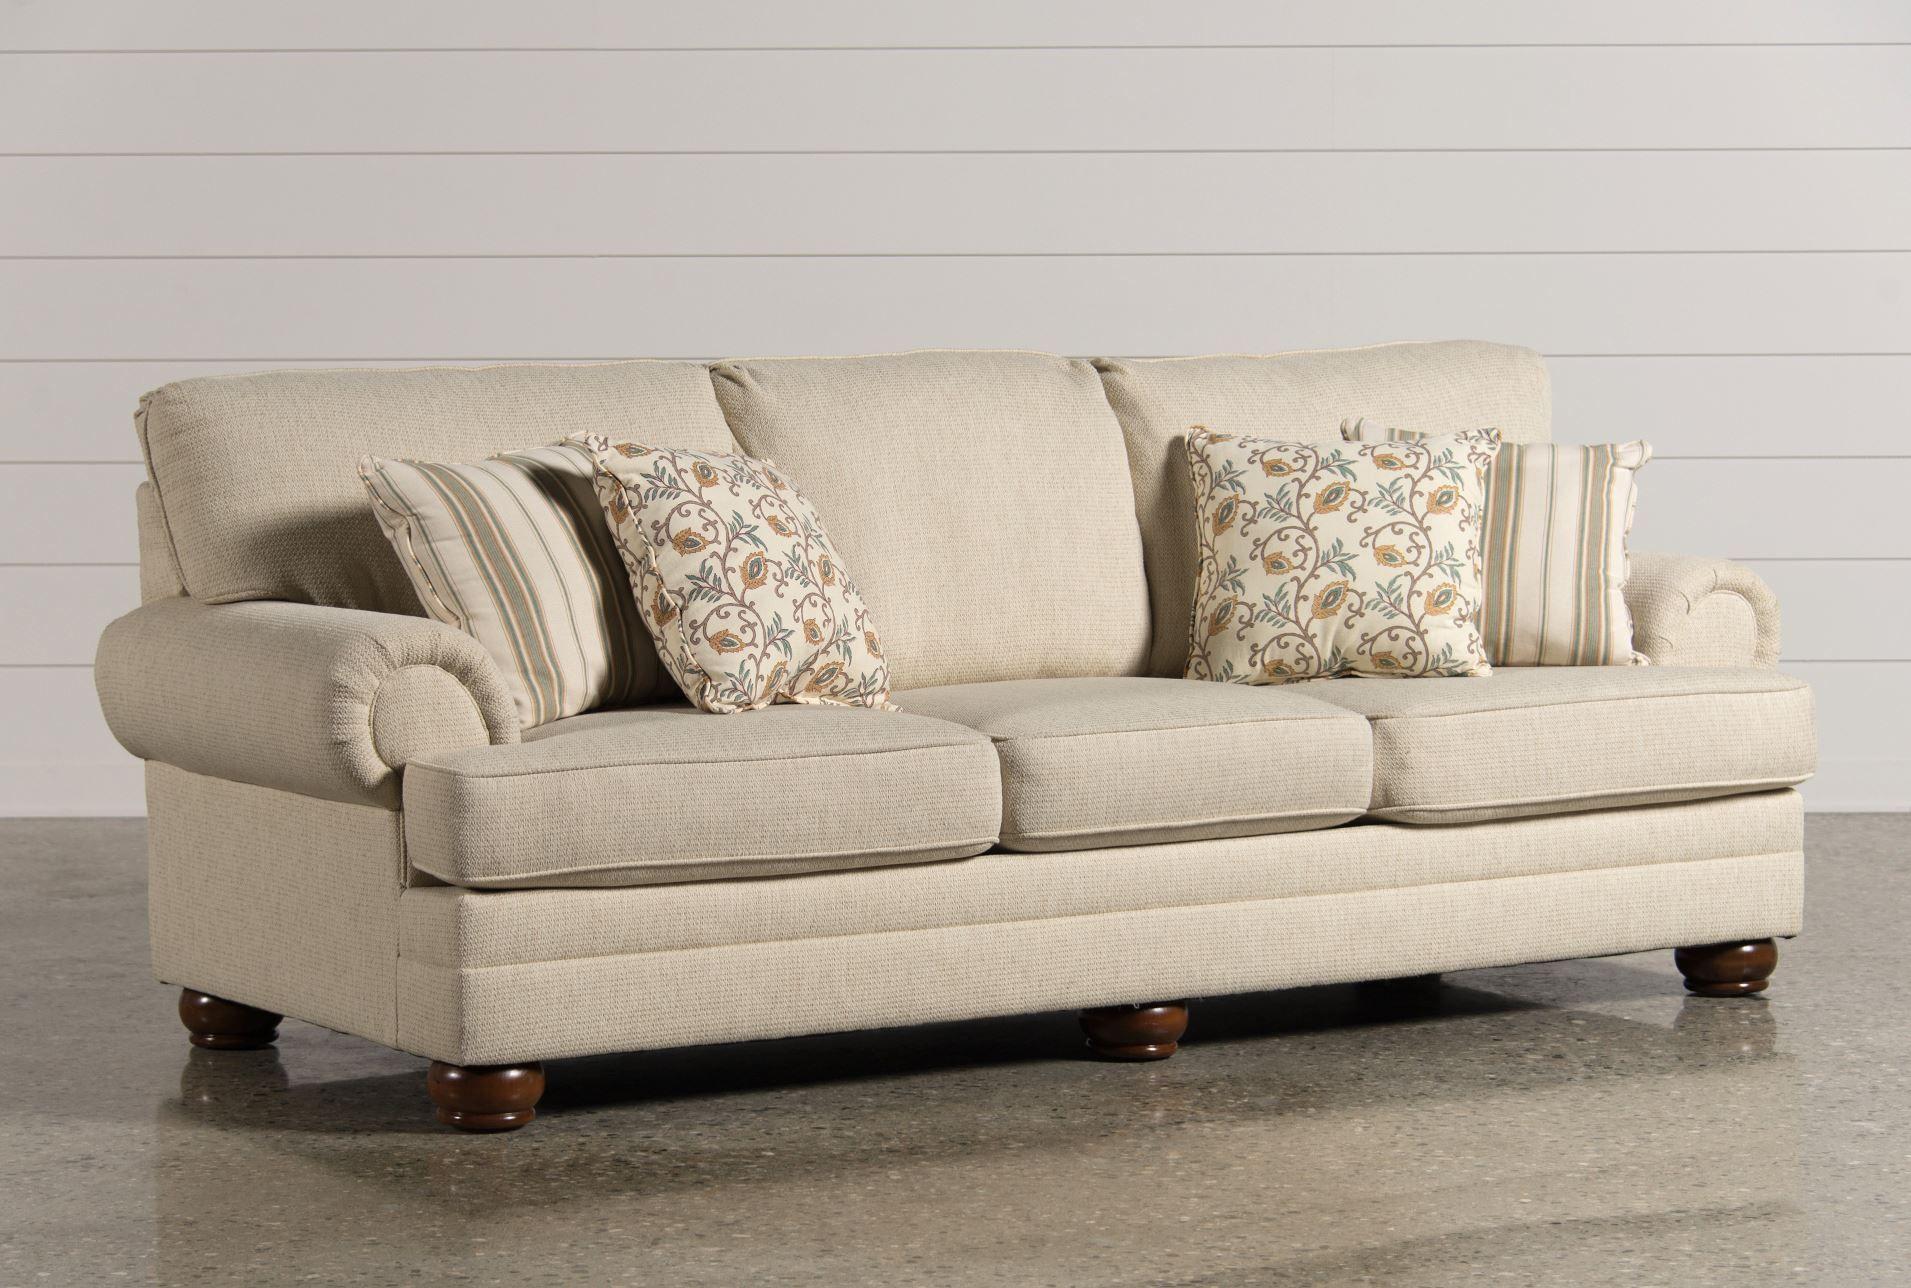 Beau Danielle Sofa. New Living RoomLiving SpacesFabric ...